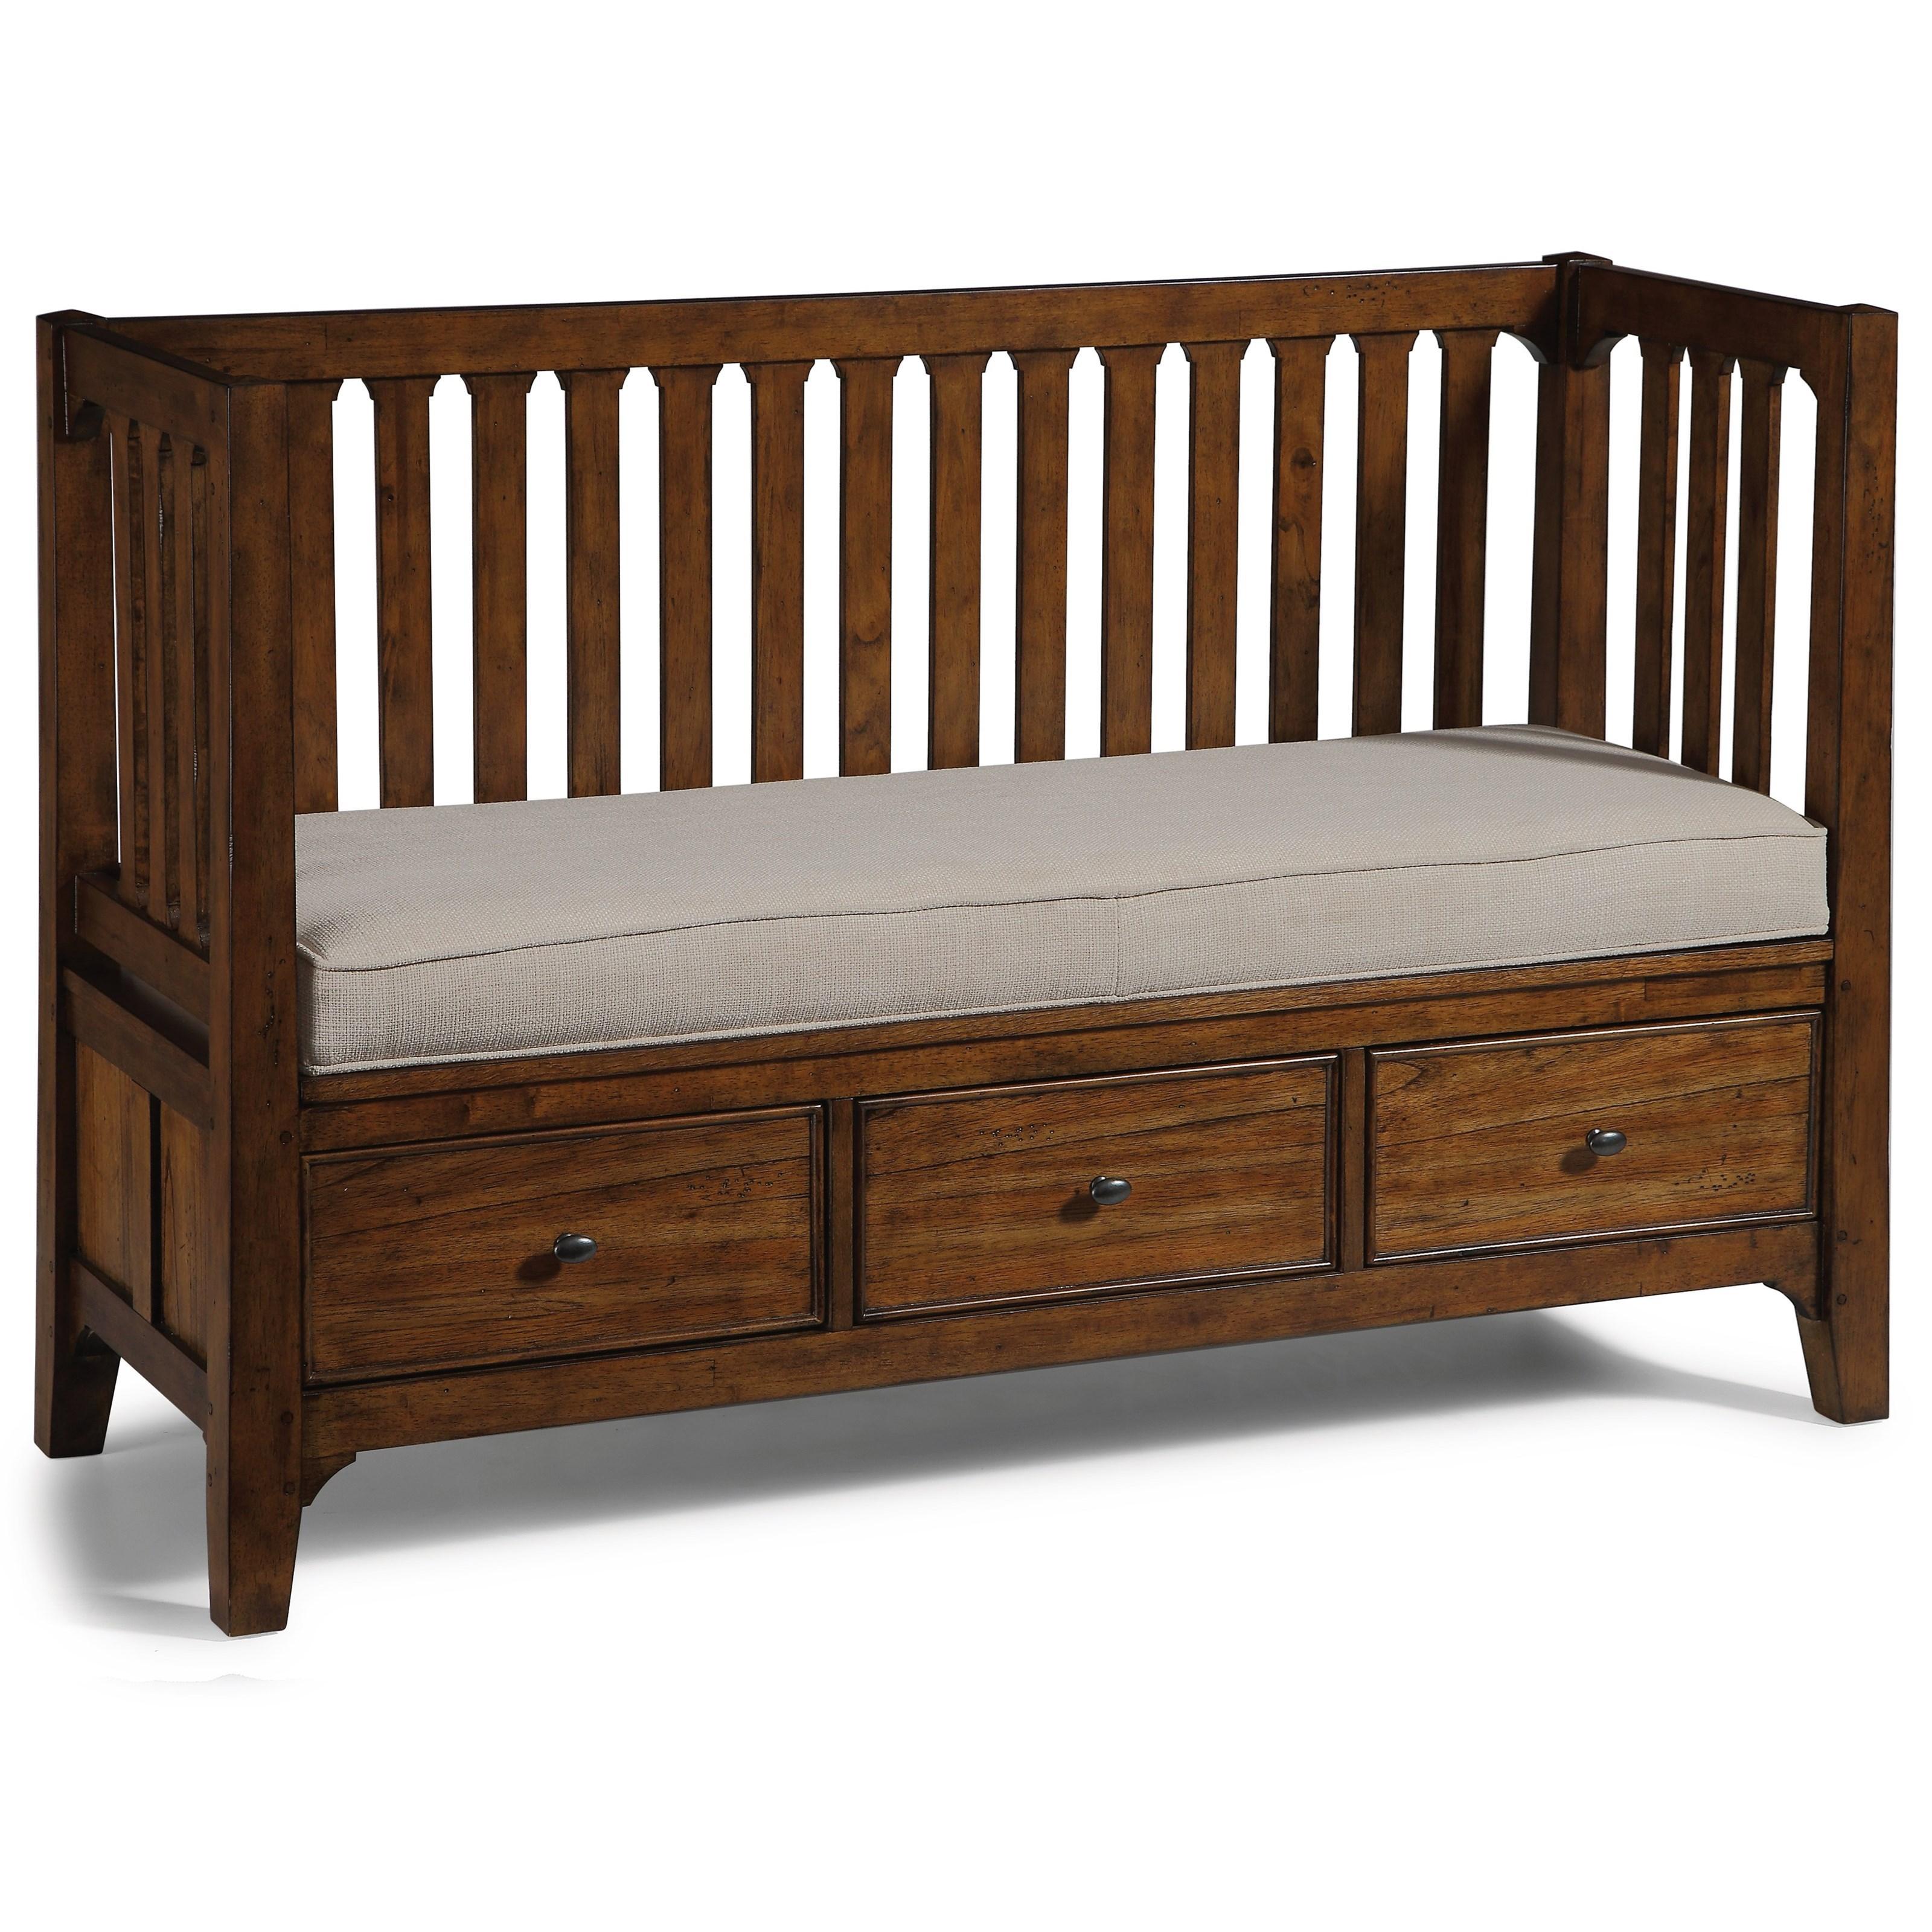 Flexsteel Wynwood Collection Windsor Mission Storage Bench With 3 Drawers Olinde 39 S Furniture